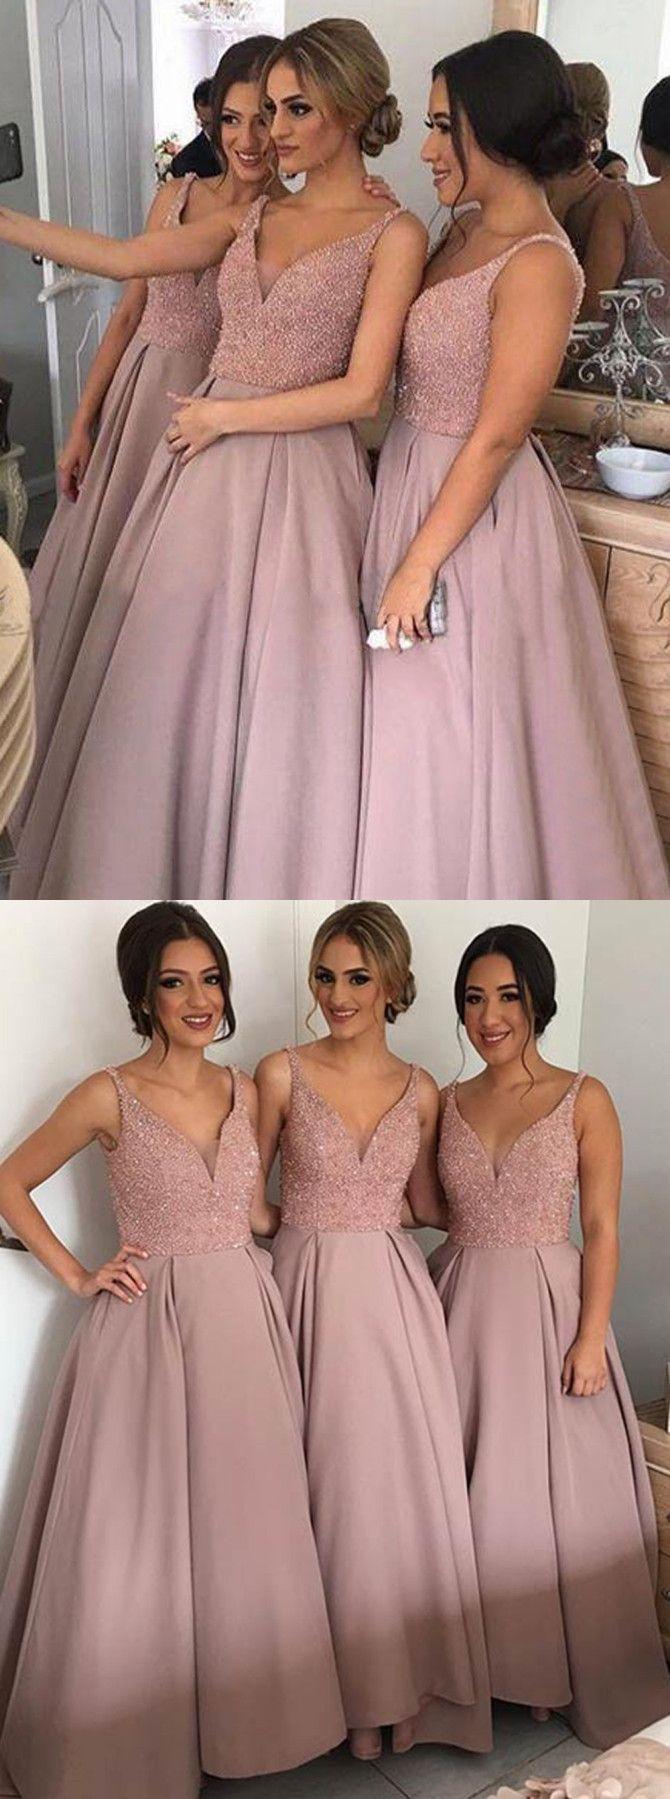 Plus size pink wedding dresses  bridesmaid dress blush bridesmaid dress bridesmaid dress plus